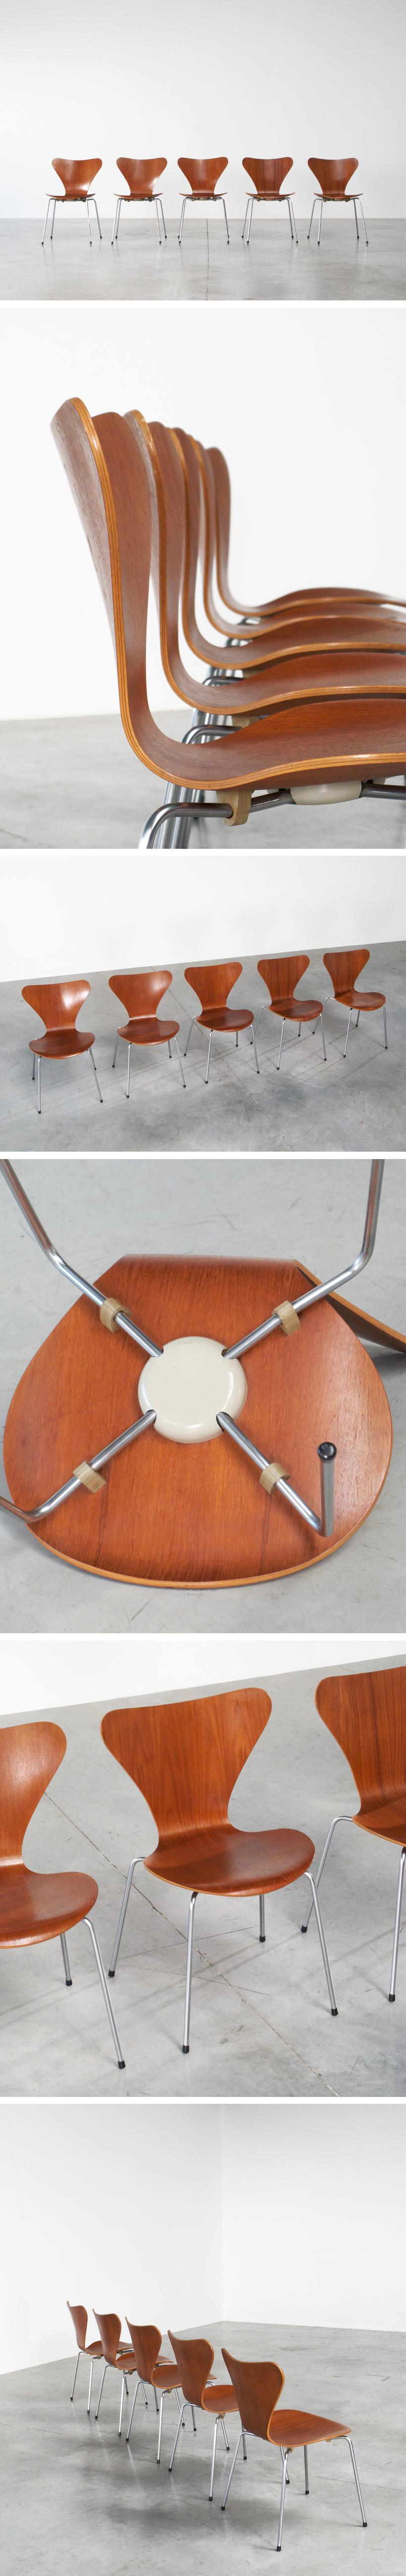 Arne Jacobsen 5 teak chairs 3107 Fritz Hansen 1972 Large